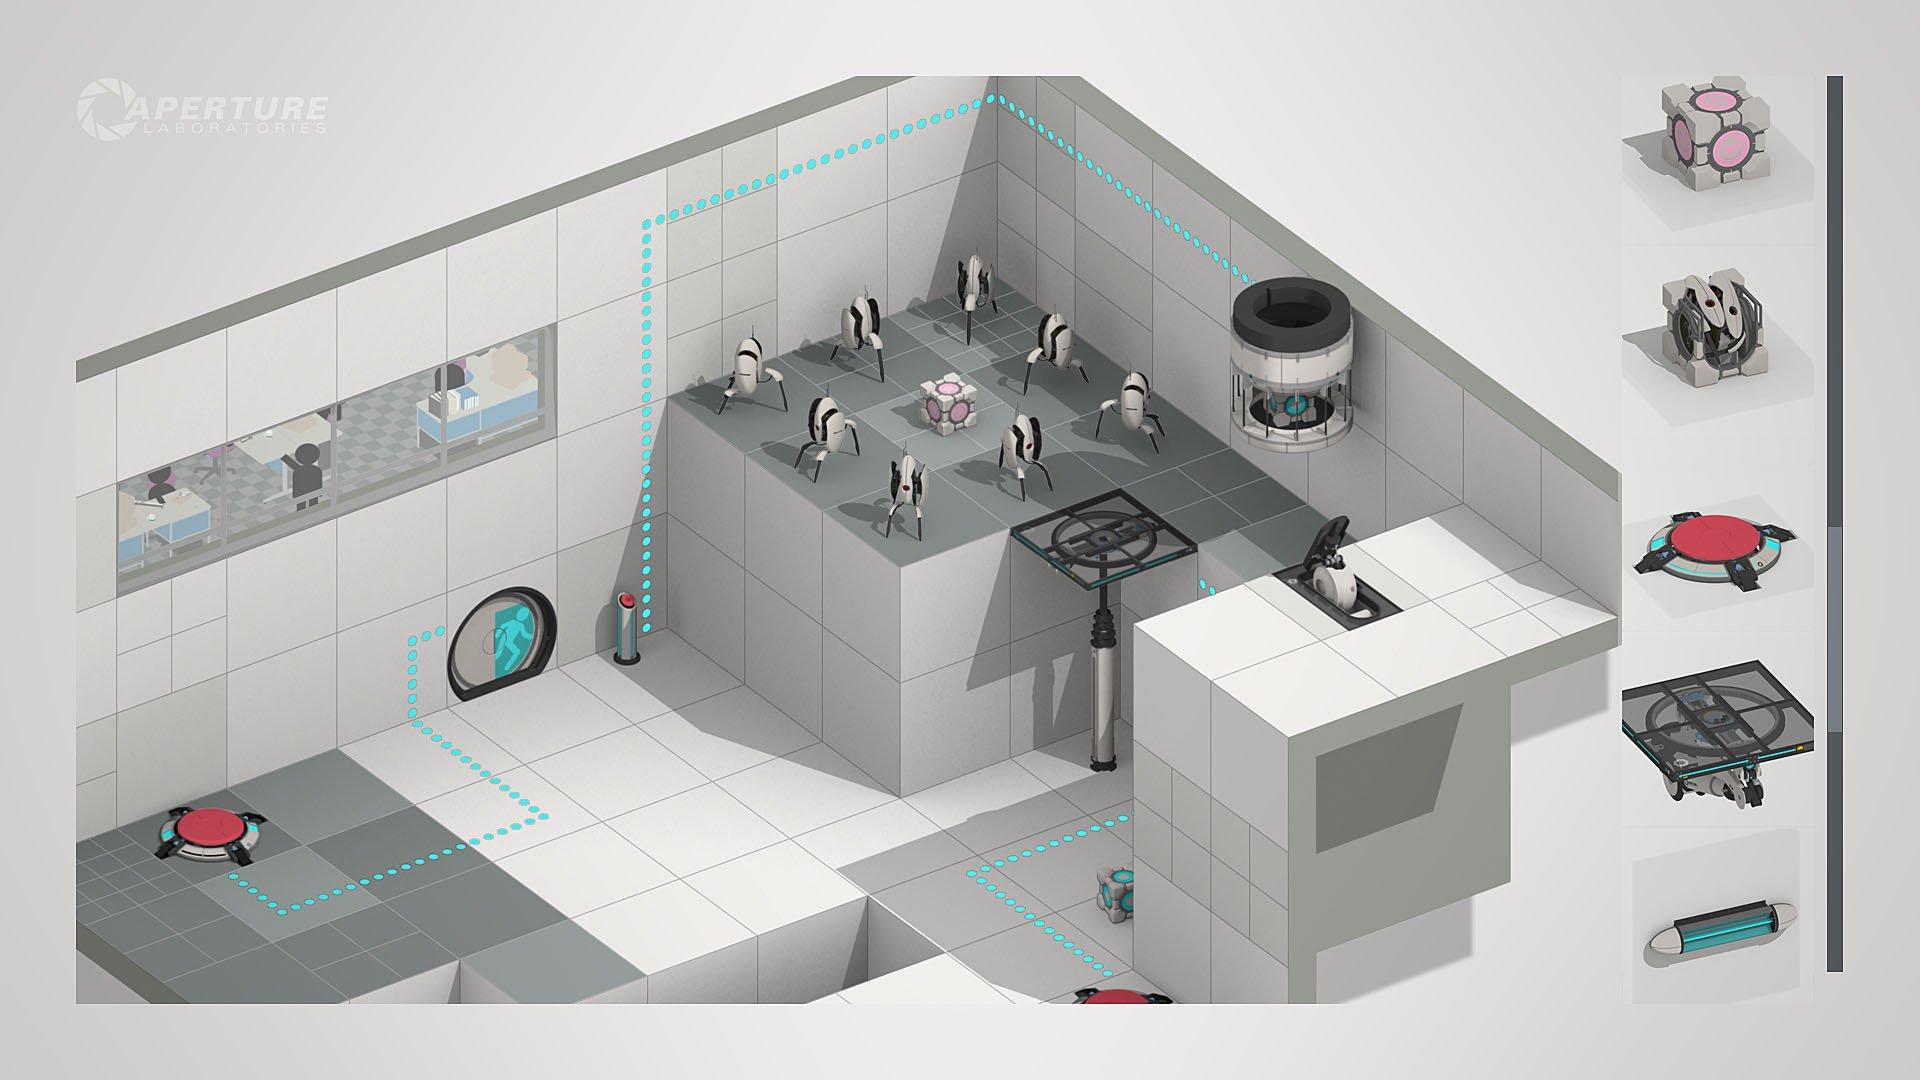 Portal2_puzzle-creator